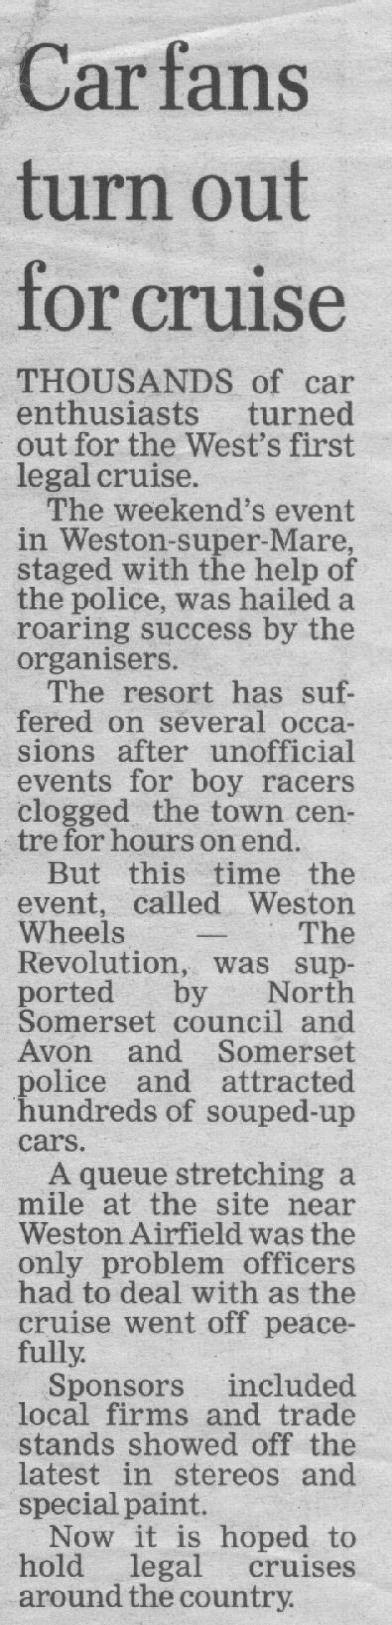 Western Daily Press - 2